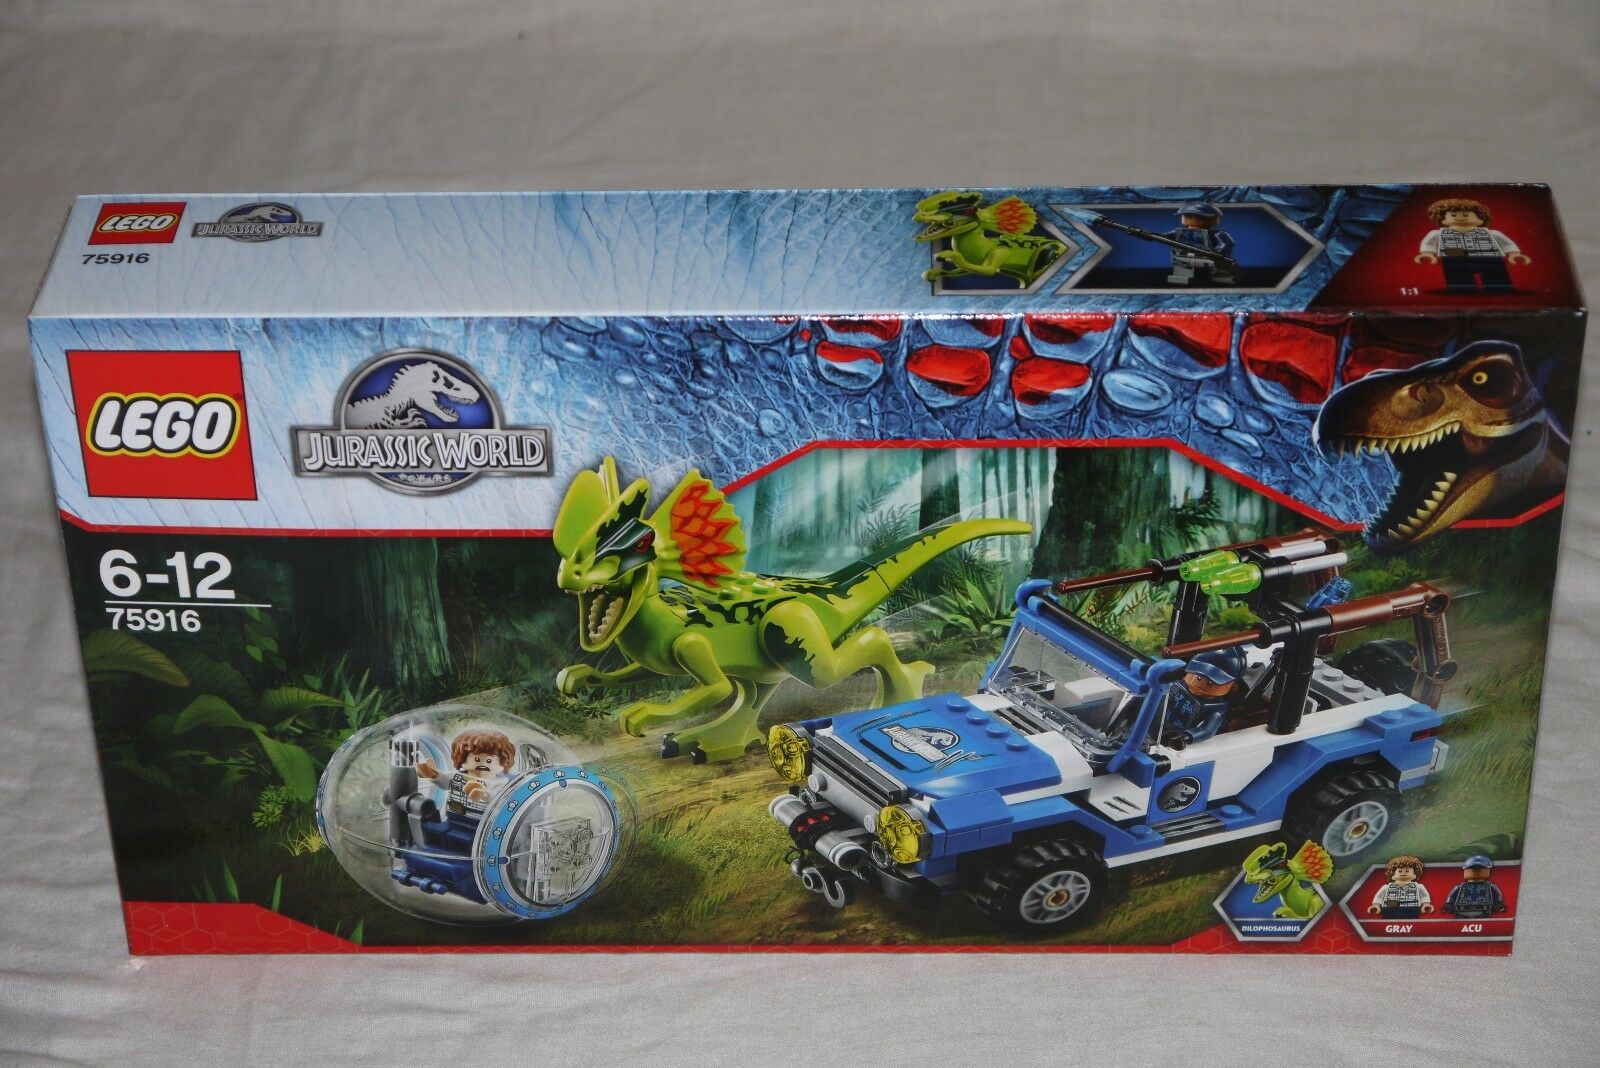 Lego Jurassic World 75916 DILOPHOSAURAS AMBUSH - Brand new